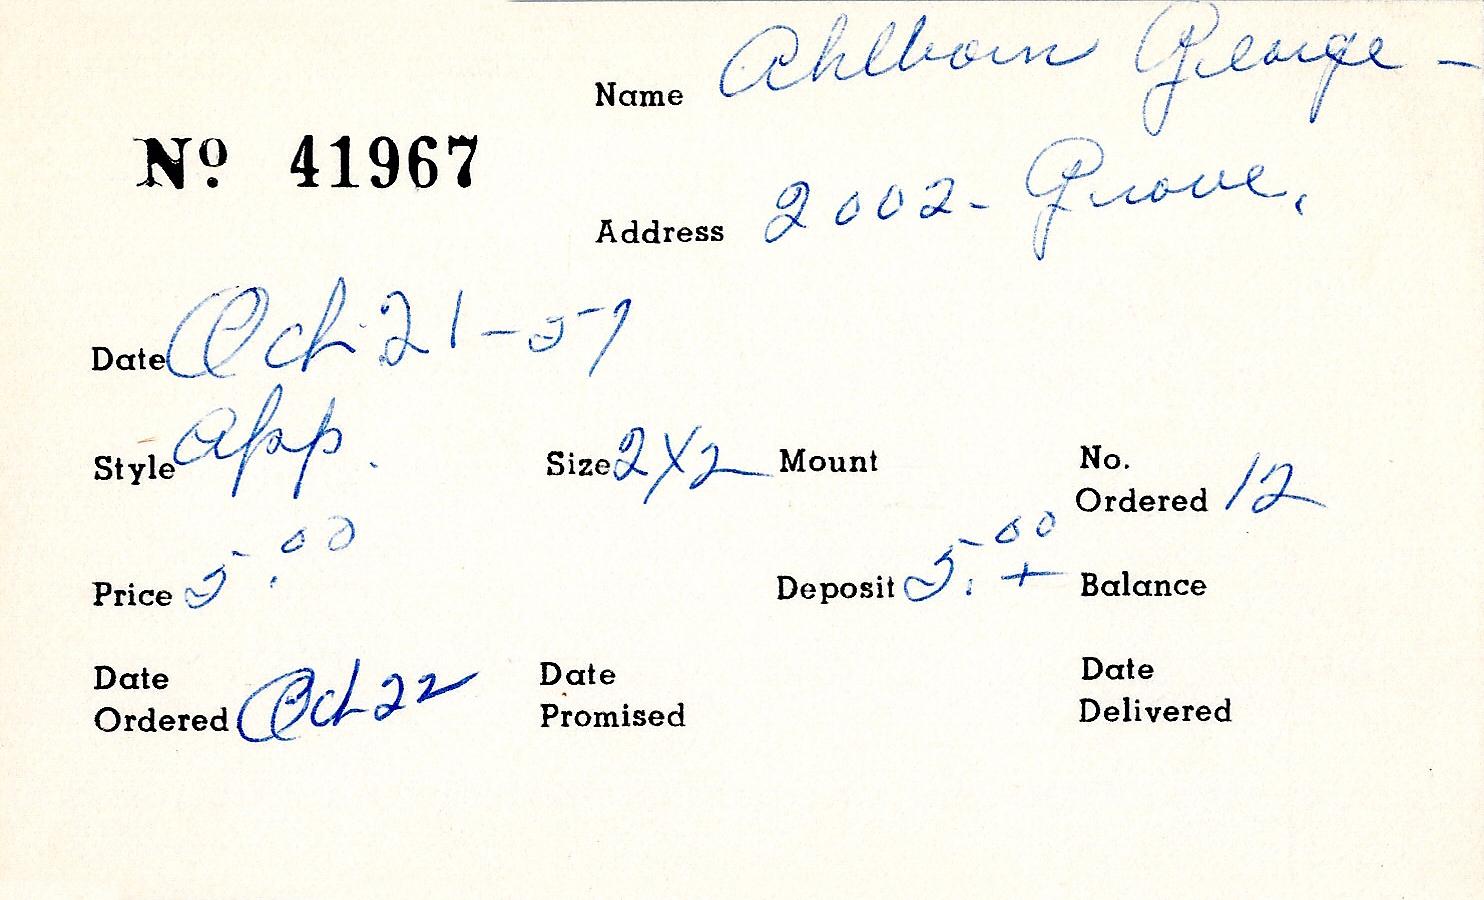 Index card for George Ahlborn